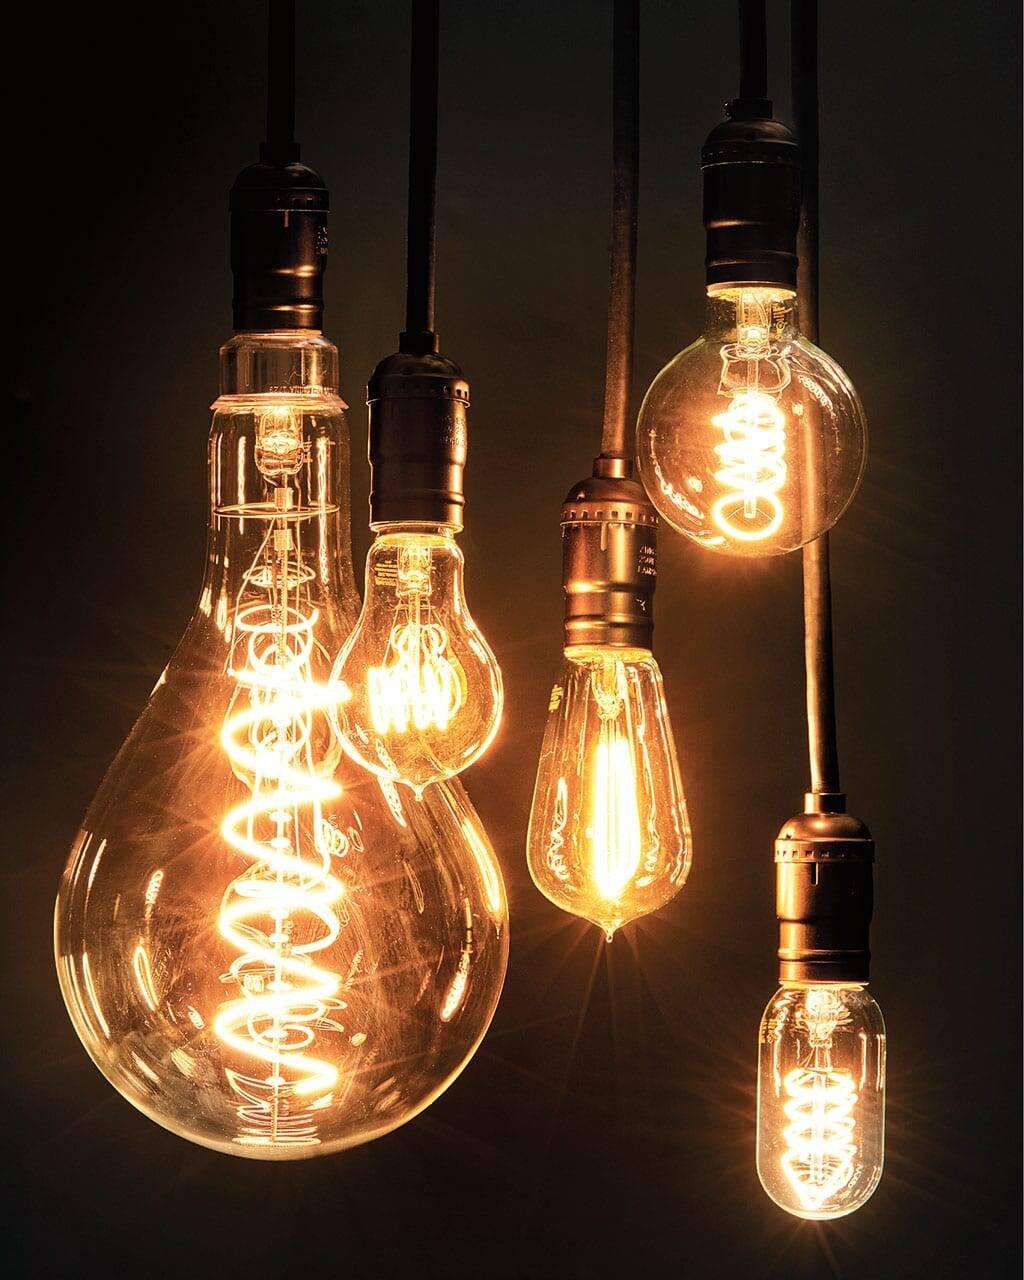 LED照明会使物体产生怎样的光影